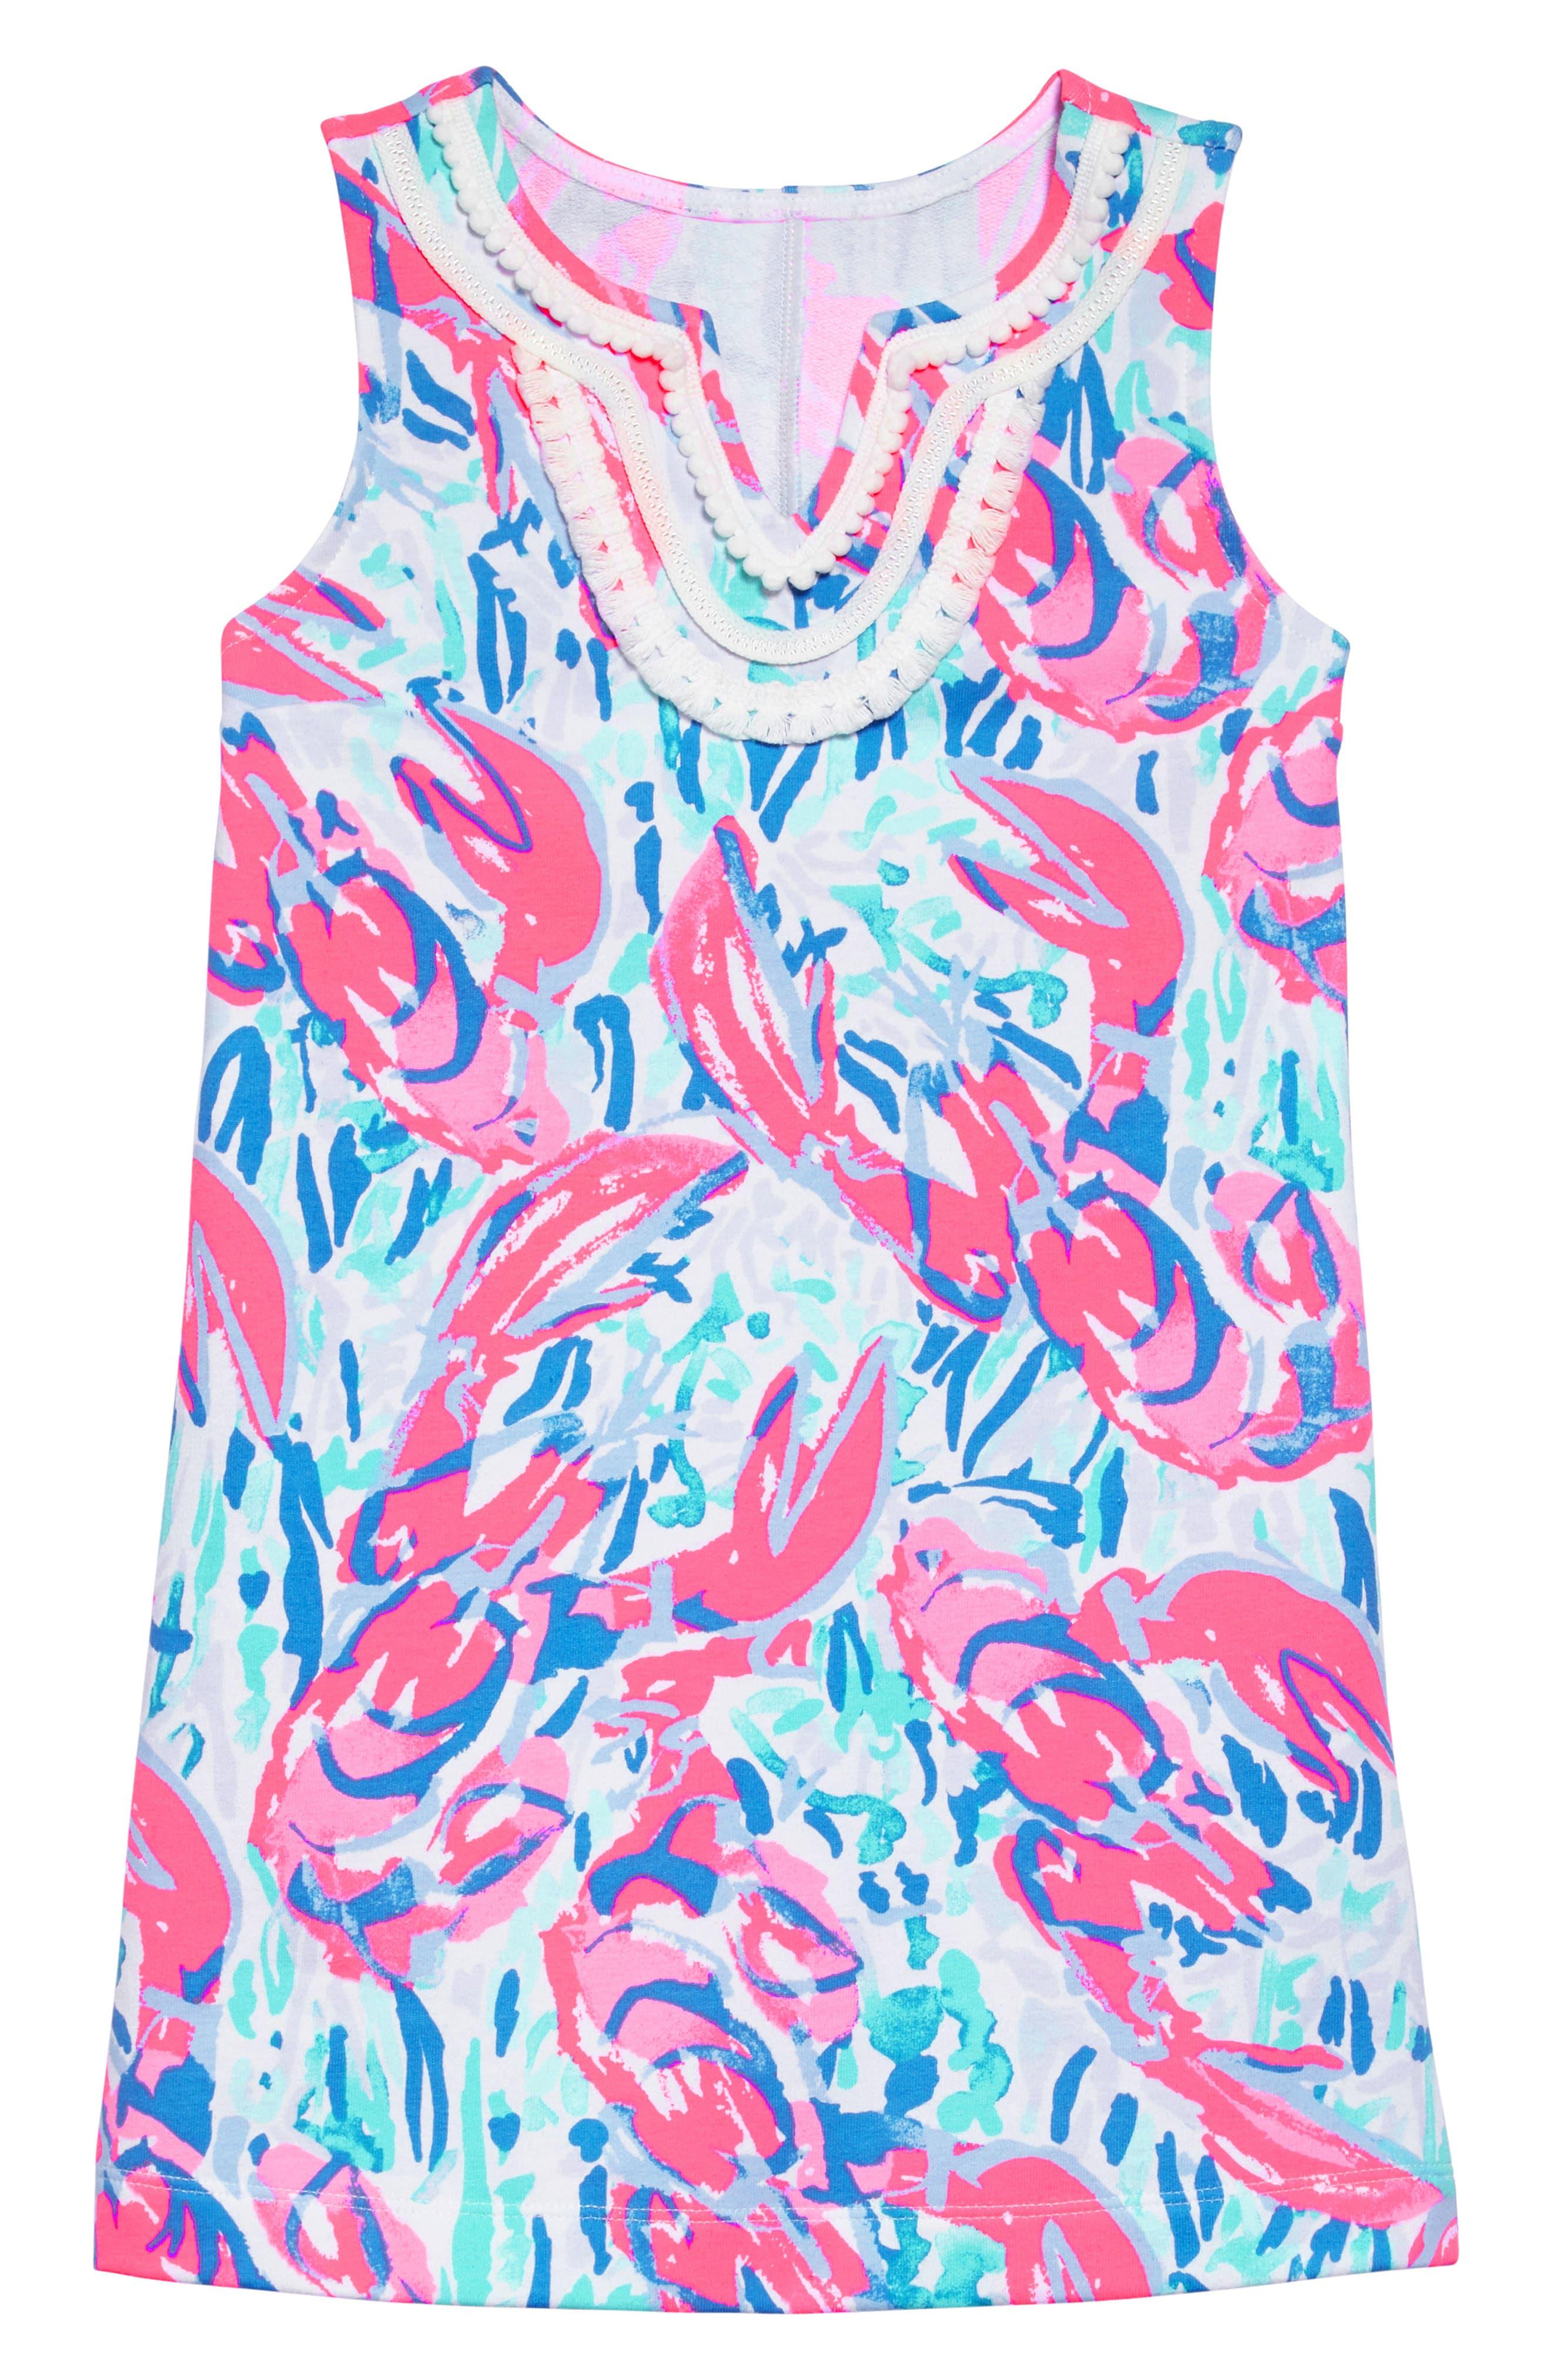 Mini Harper Shift Dress,                         Main,                         color, Cosmic Coral Cracked Up